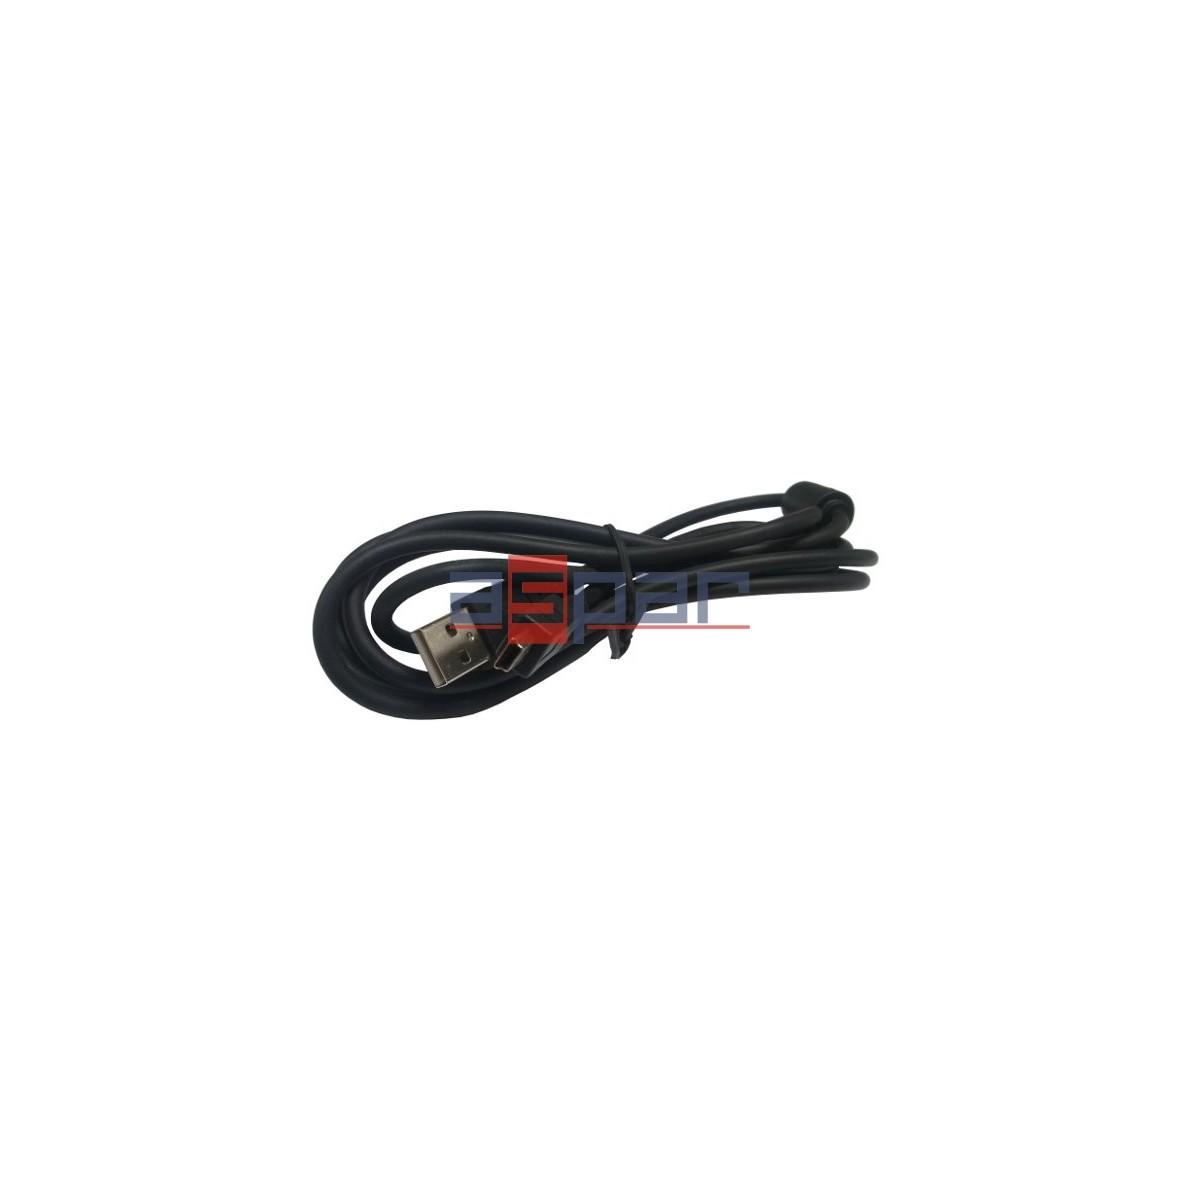 Programming cable, mini USB